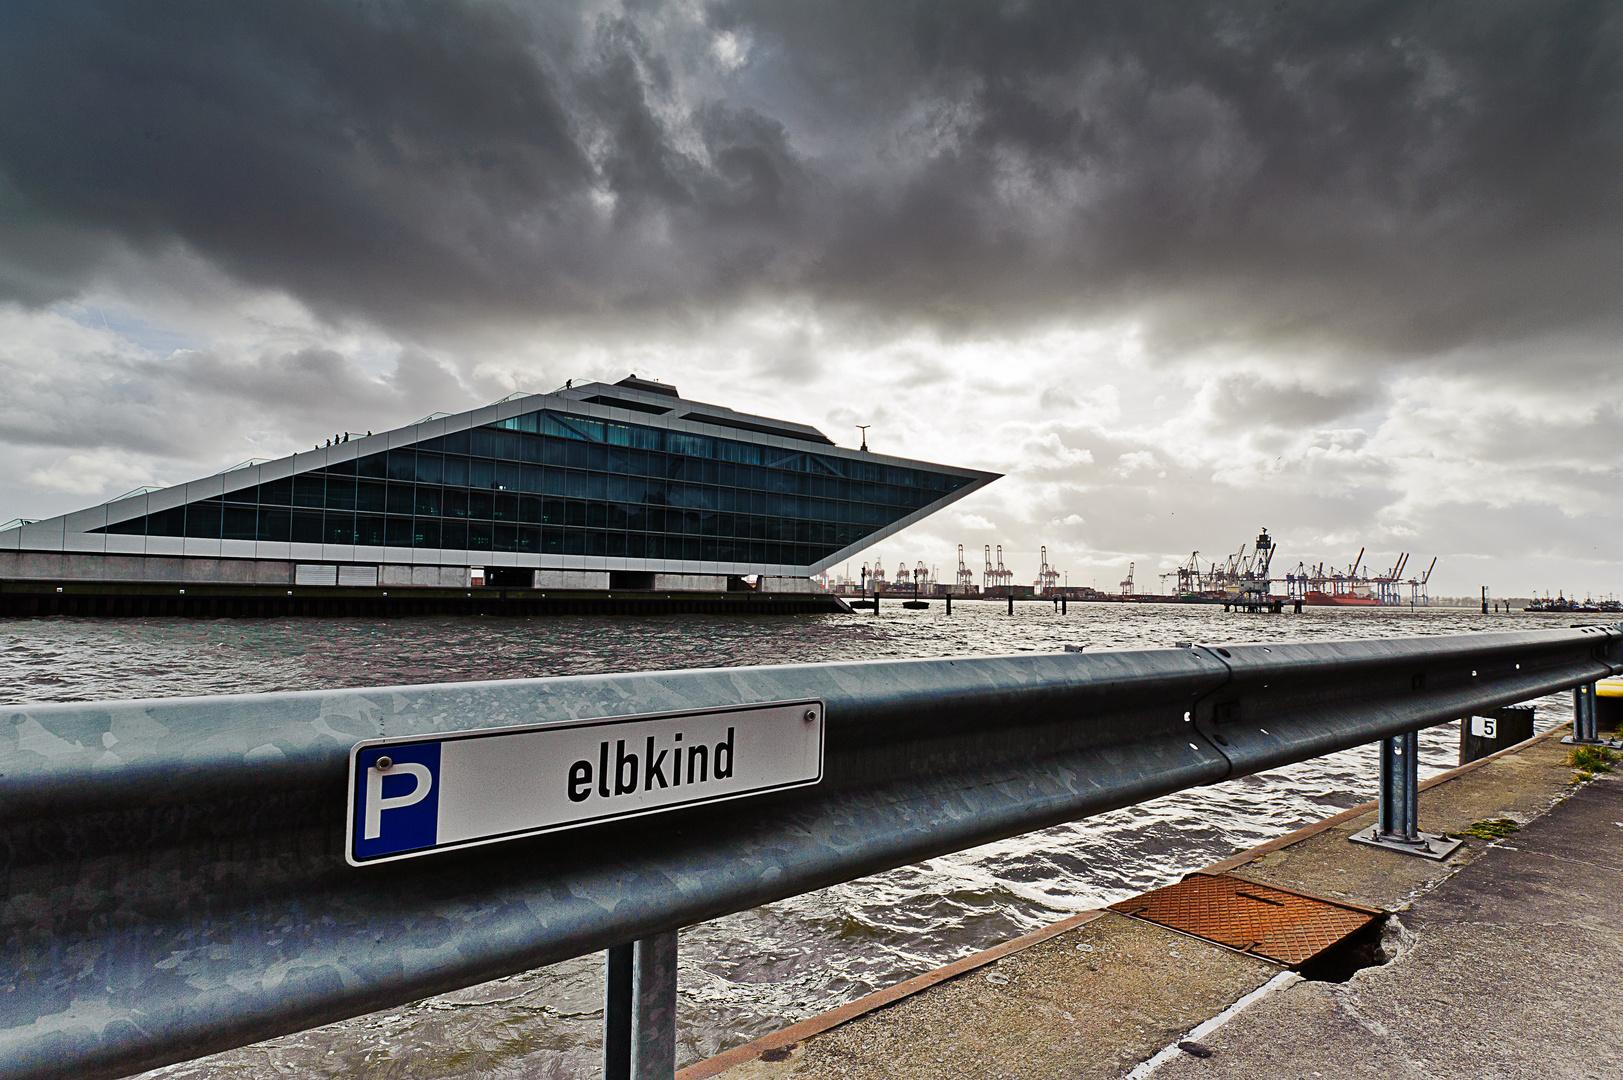 Elbkind (Dockland Hamburg)